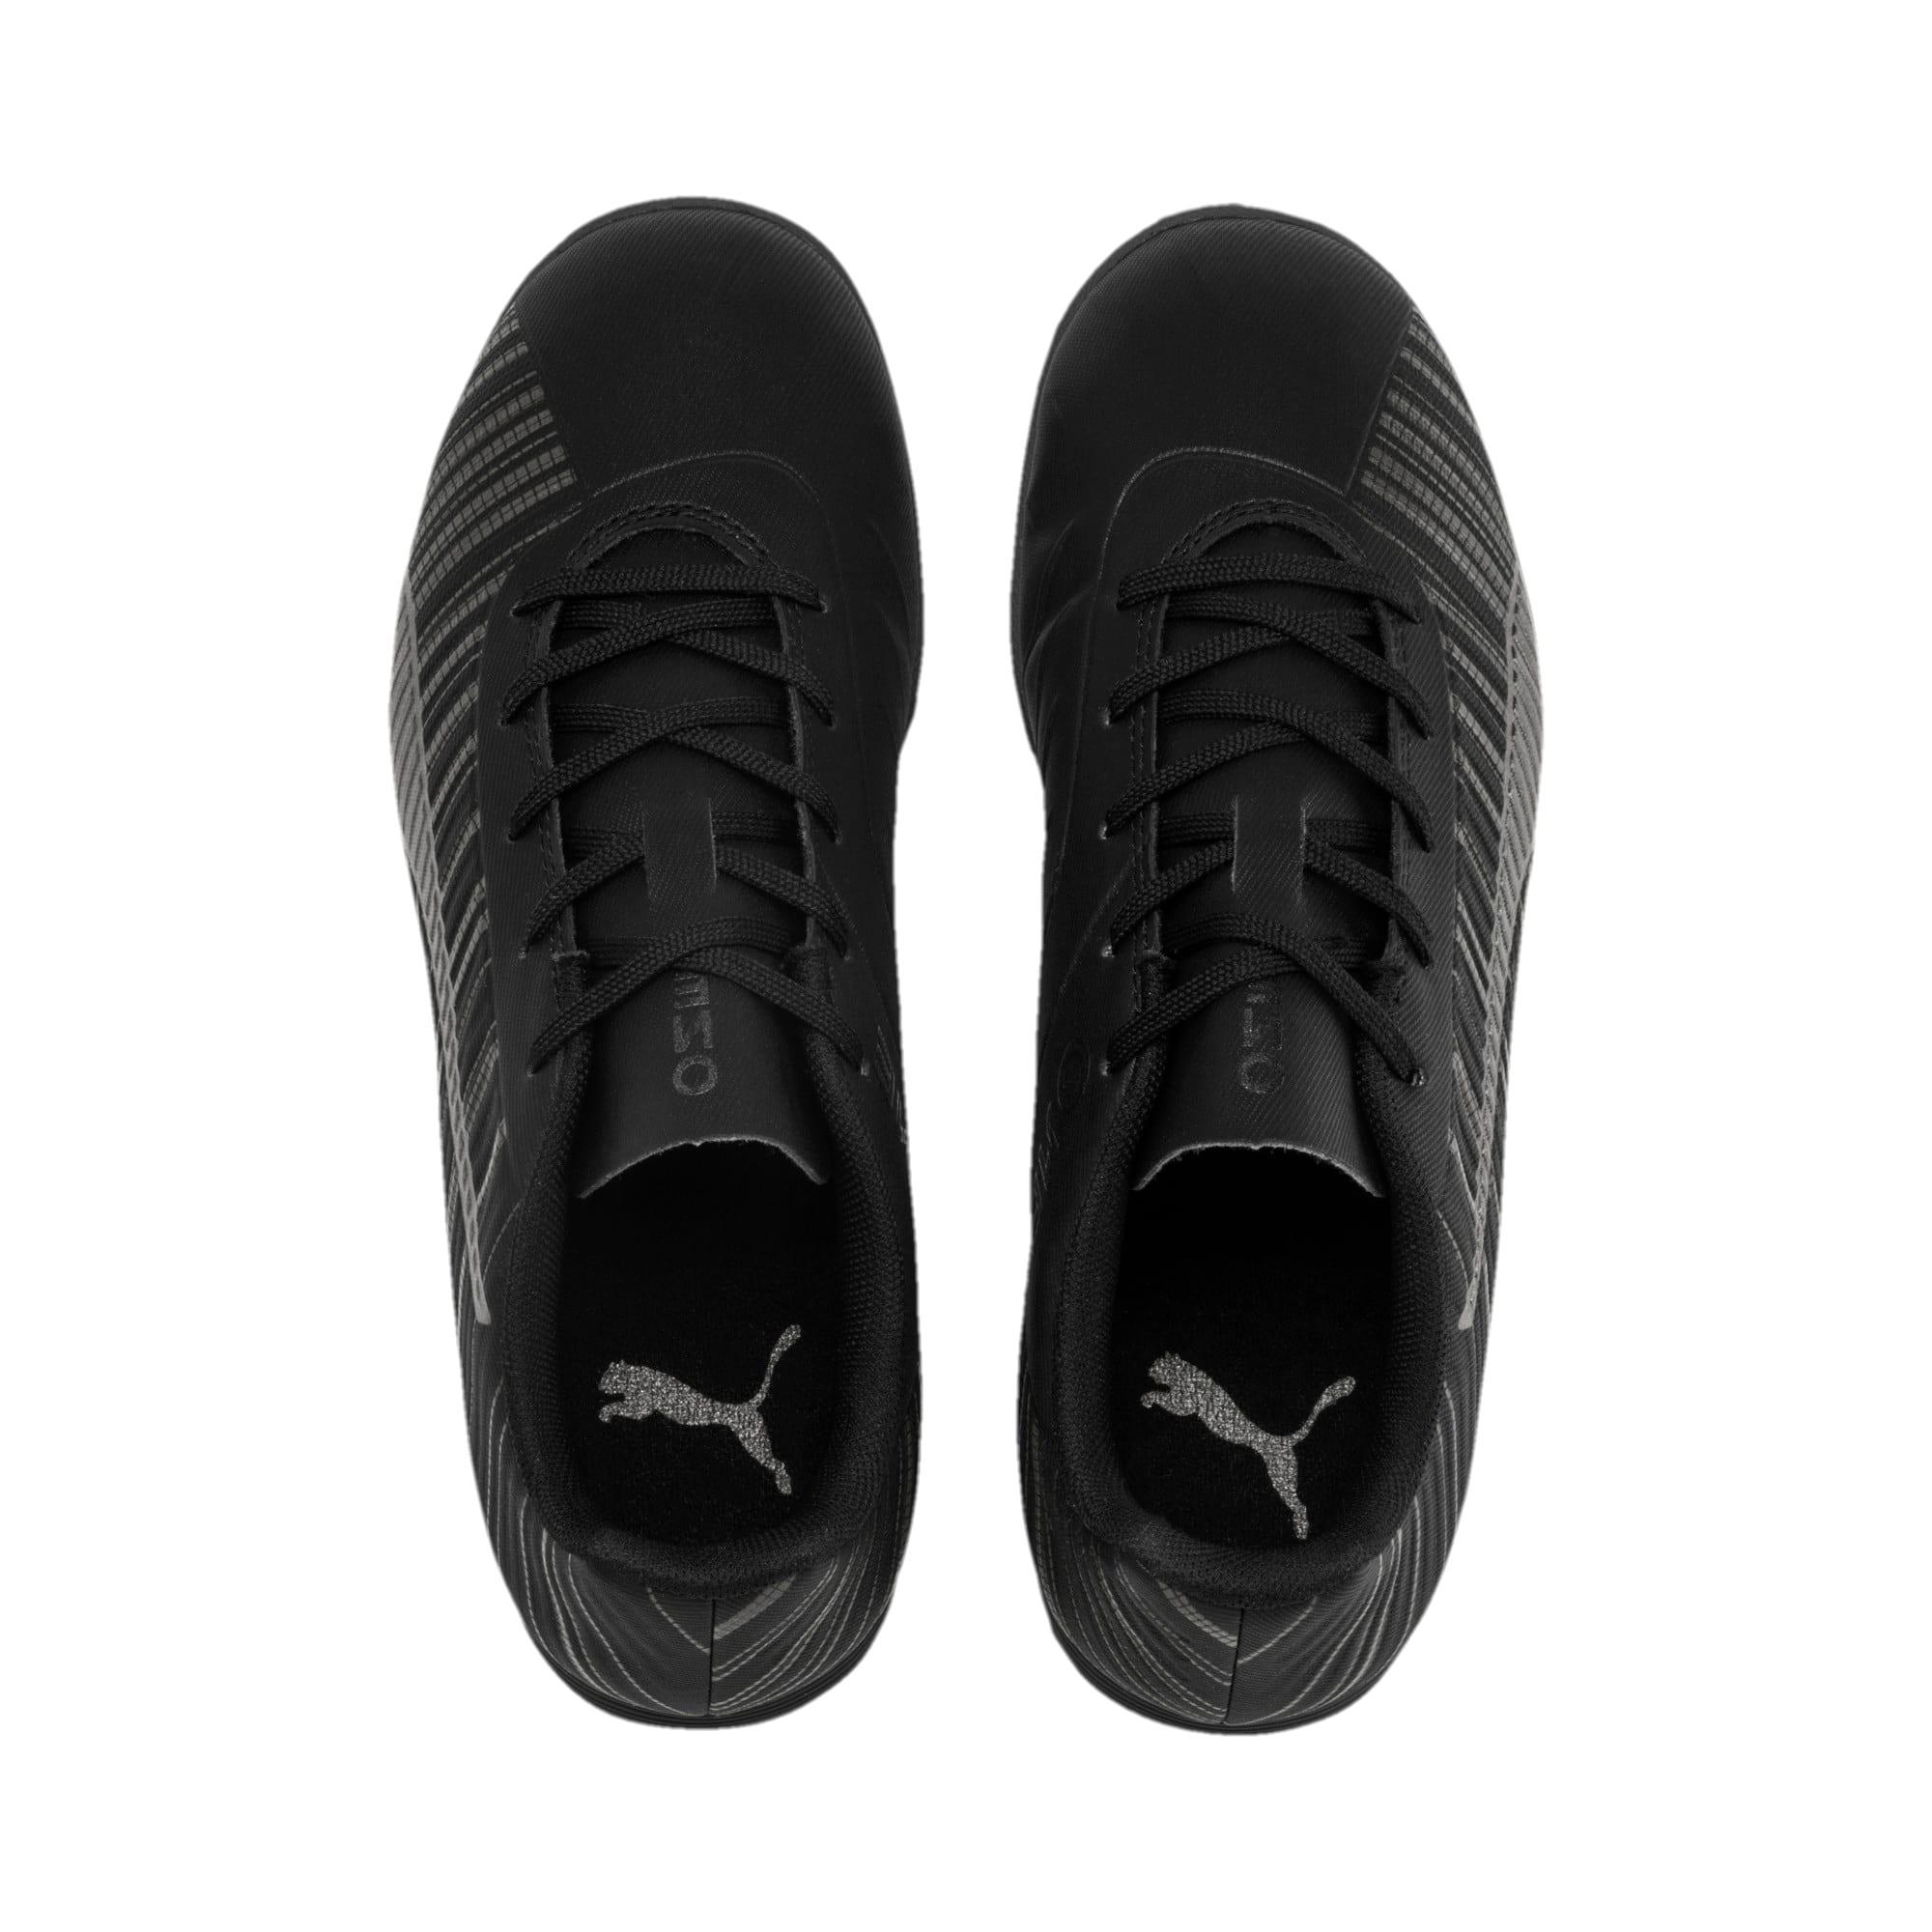 Thumbnail 6 of PUMA ONE 5.4 IT Soccer Shoes JR, Black-Black-Puma Aged Silver, medium